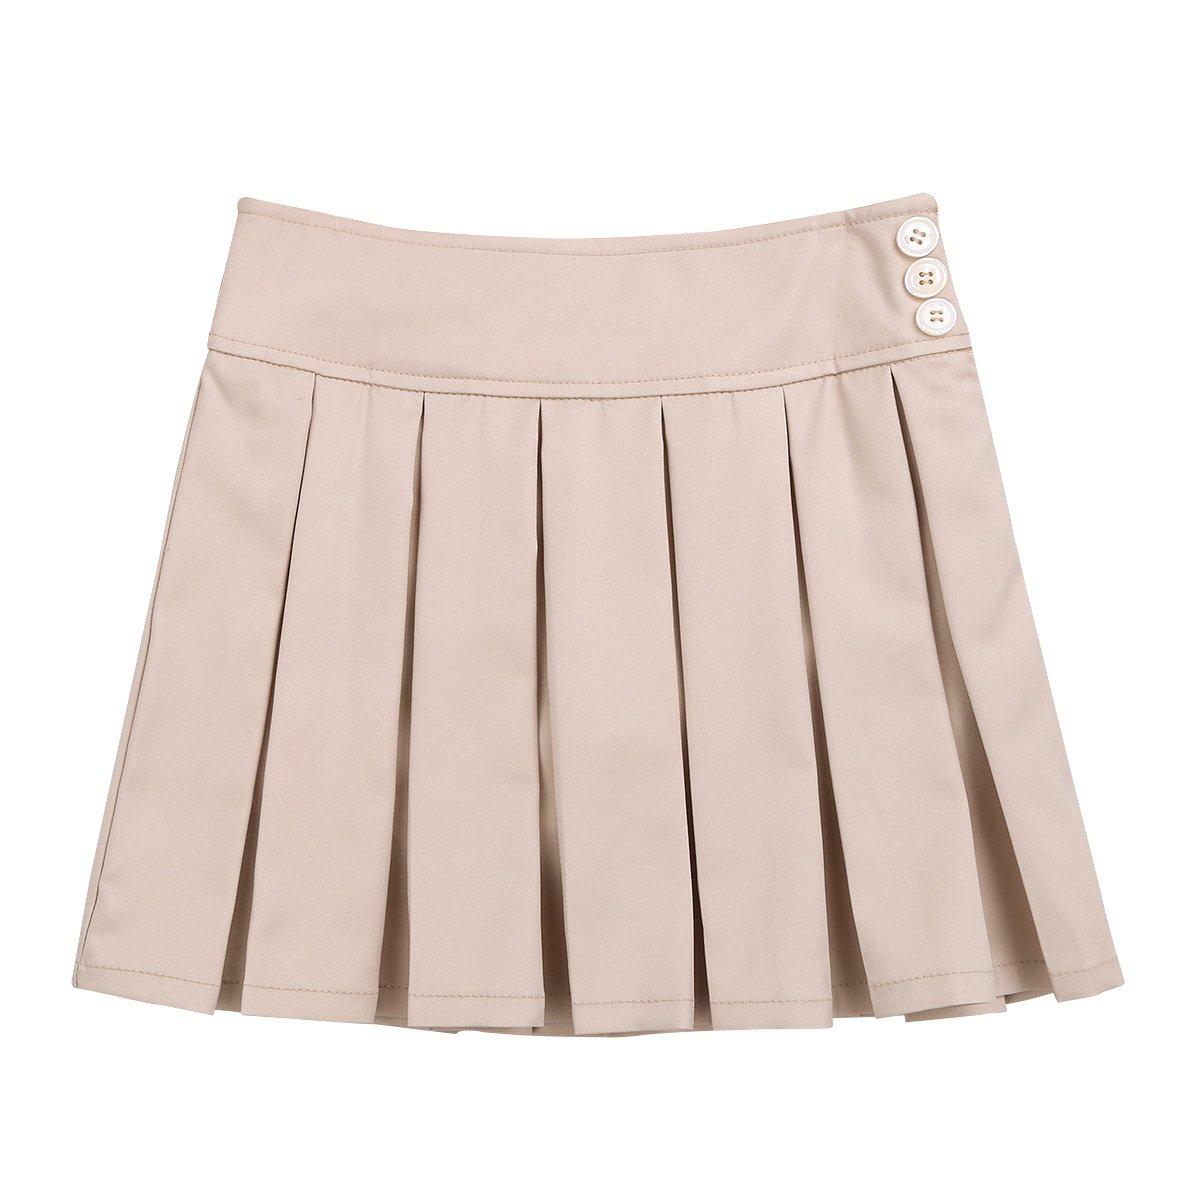 Freebily Kids Girls' School Uniform Pleated Scooter Skirt Two-Tab Side Zipper Buttons Scooter